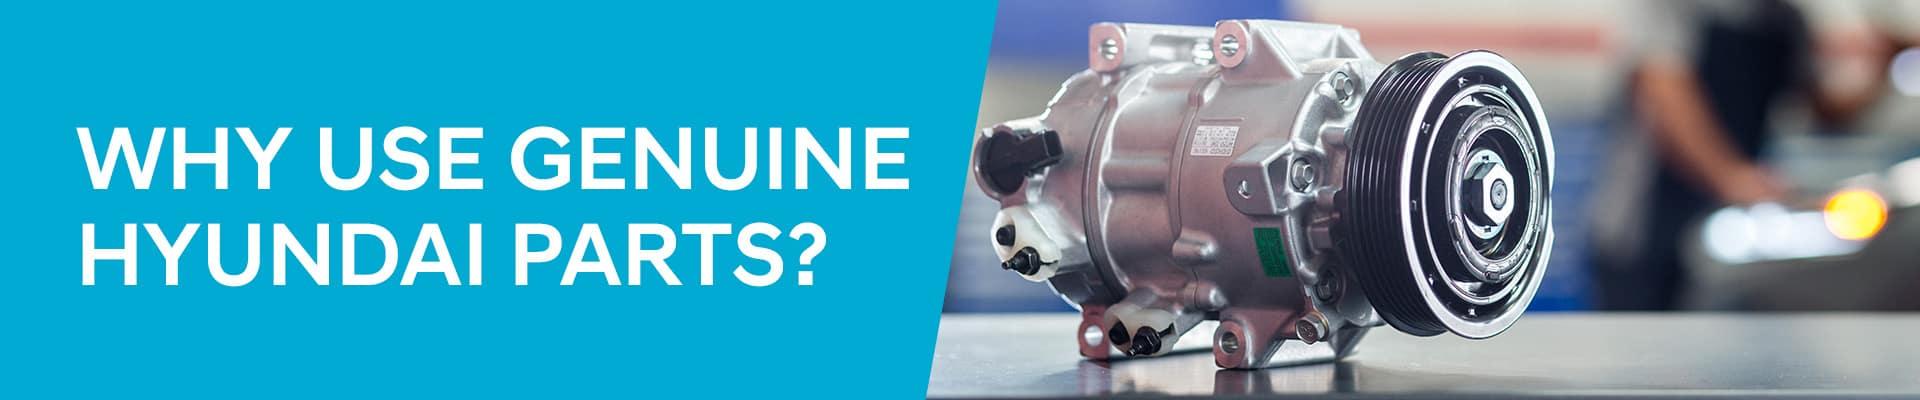 Why Use Genuine OEM Parts vs Aftermarket